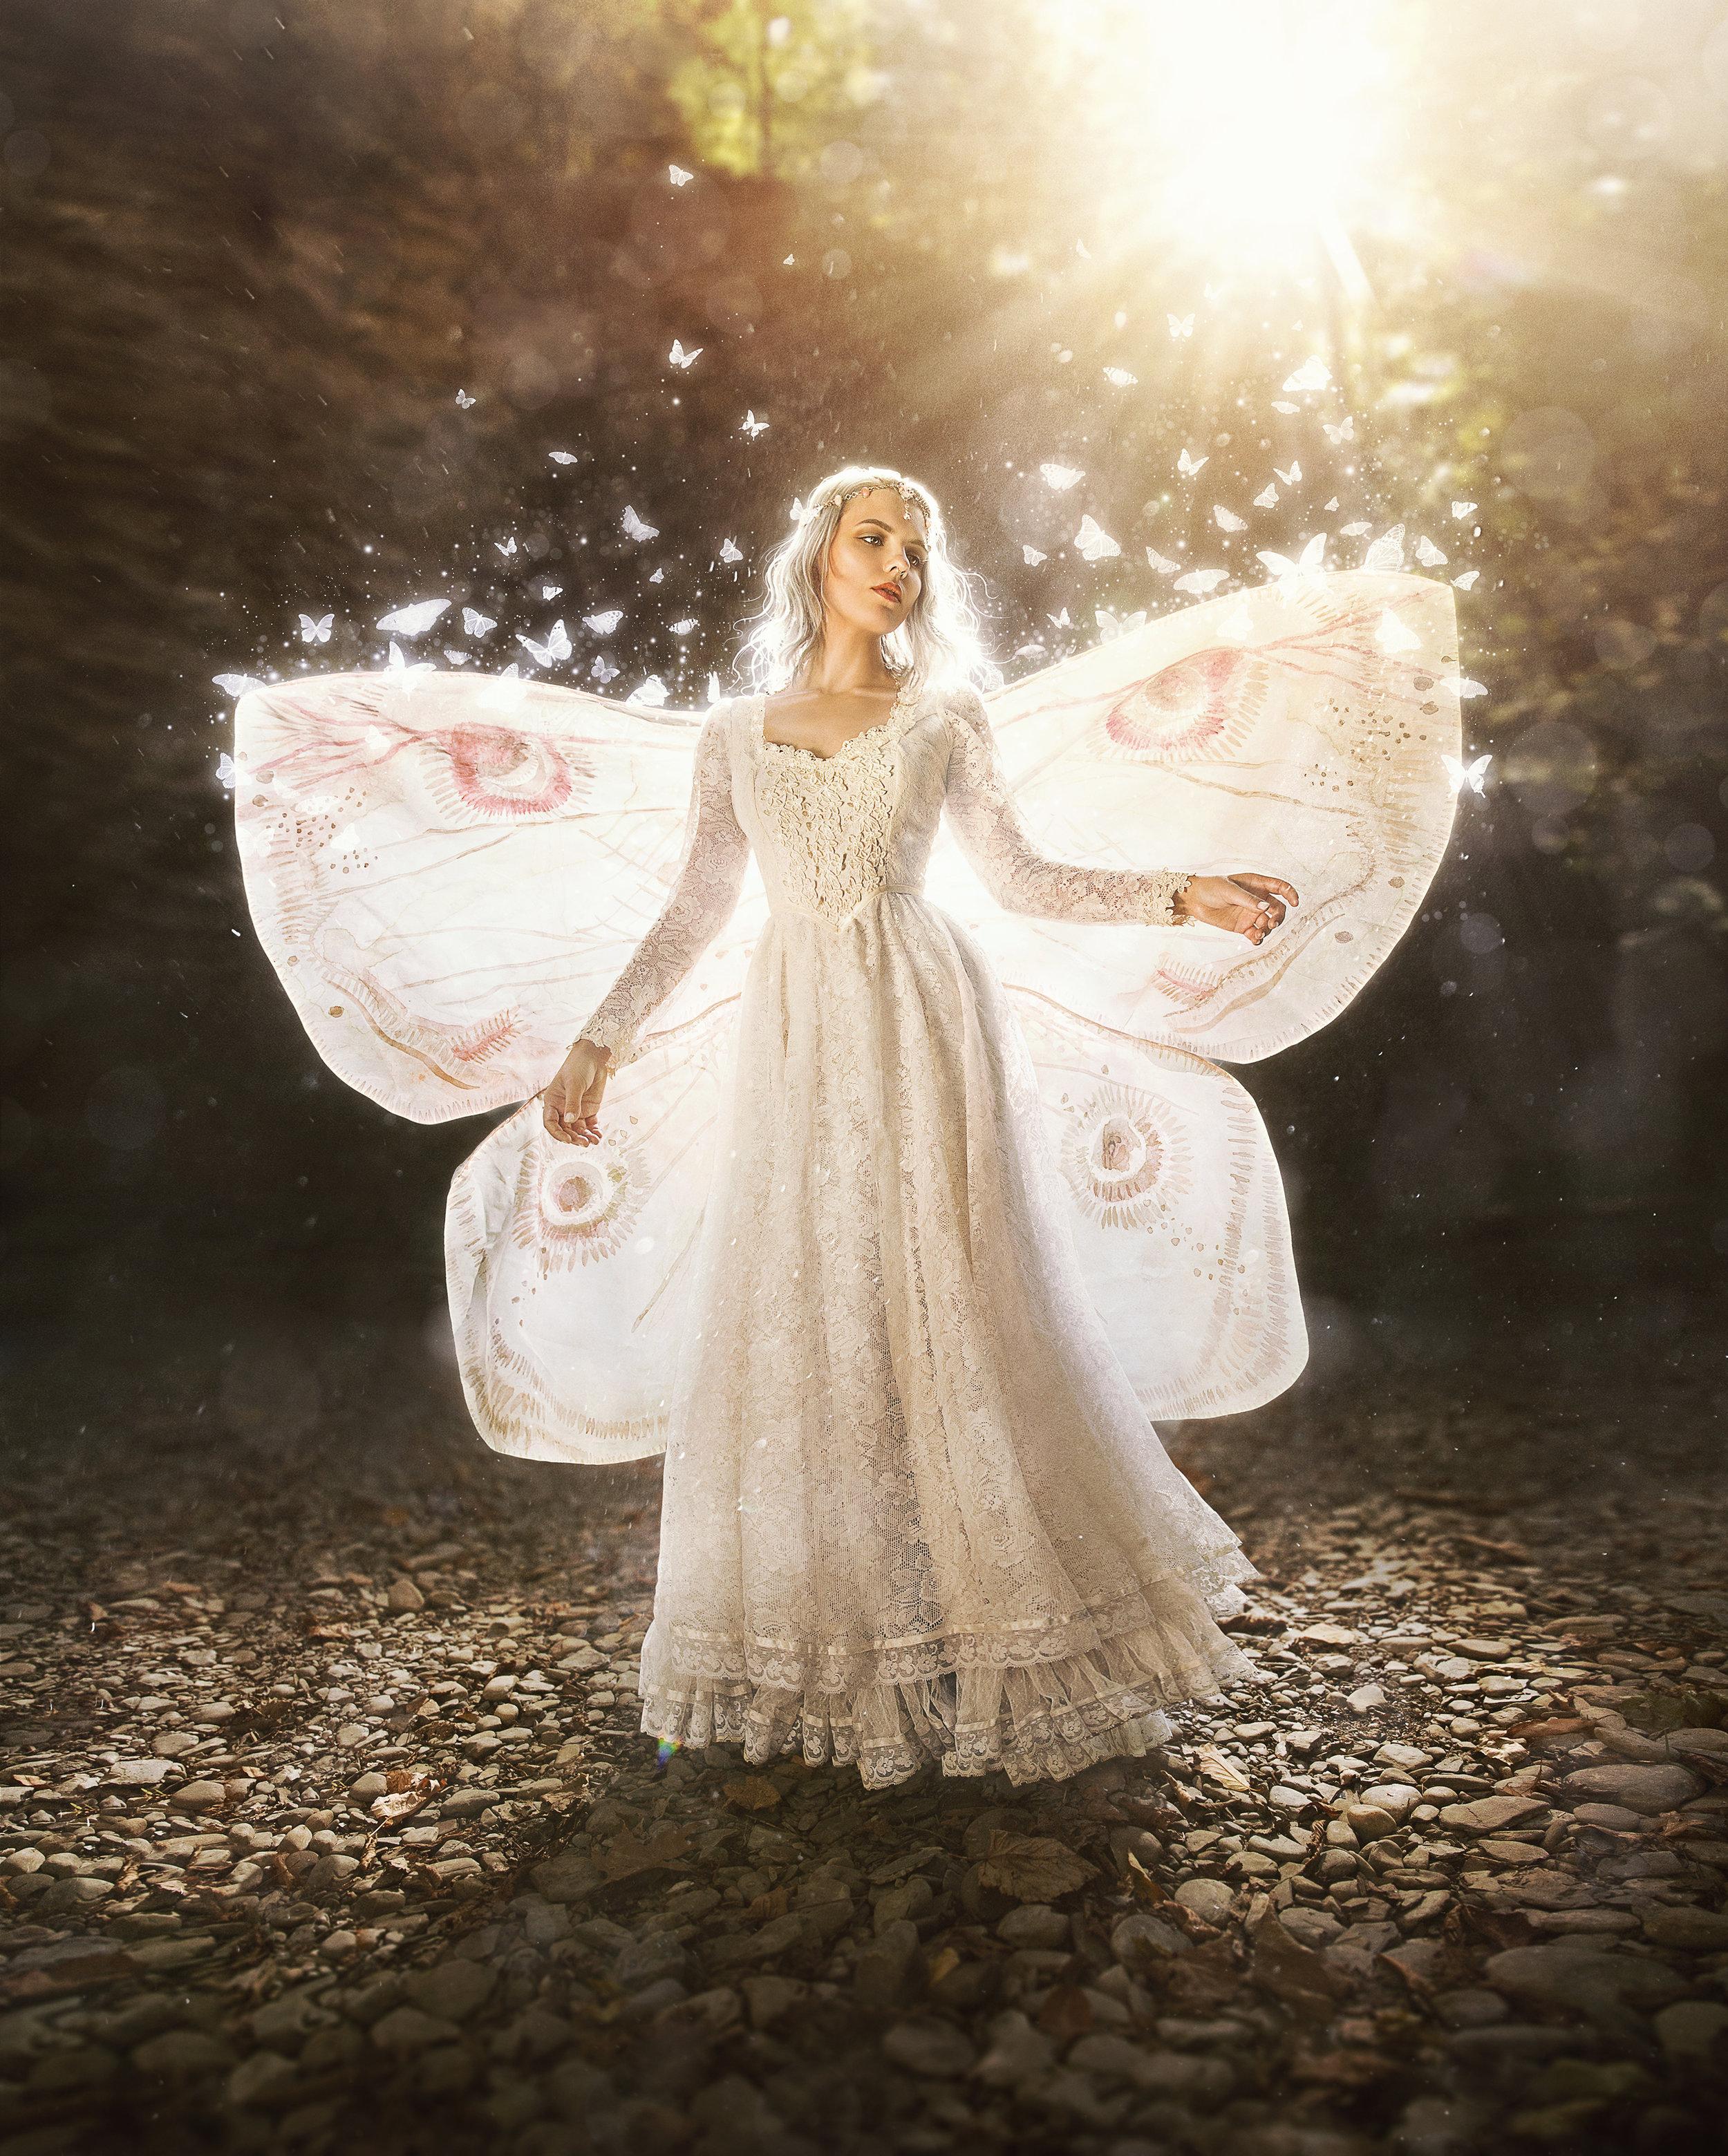 """Lady of the Light"" Featuring Laryssa Fierle"